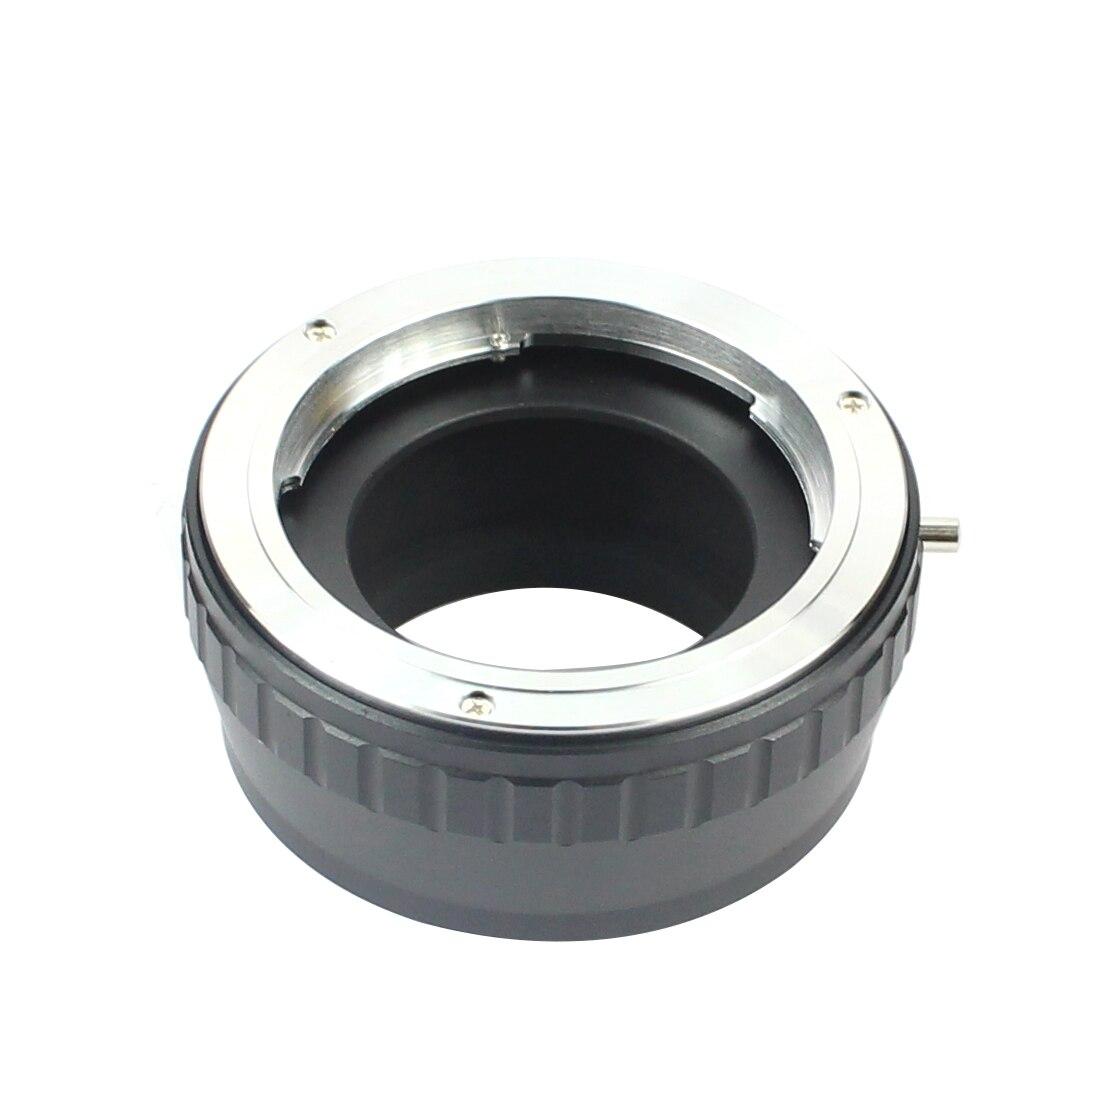 Anillo adaptador de lente de cámara BGNING para Rollei QBM lente de montaje a FX para Fujifilm FUJI X-Pro1 X-E2 X-T1 de adaptador de lente piezas de QBM-FX